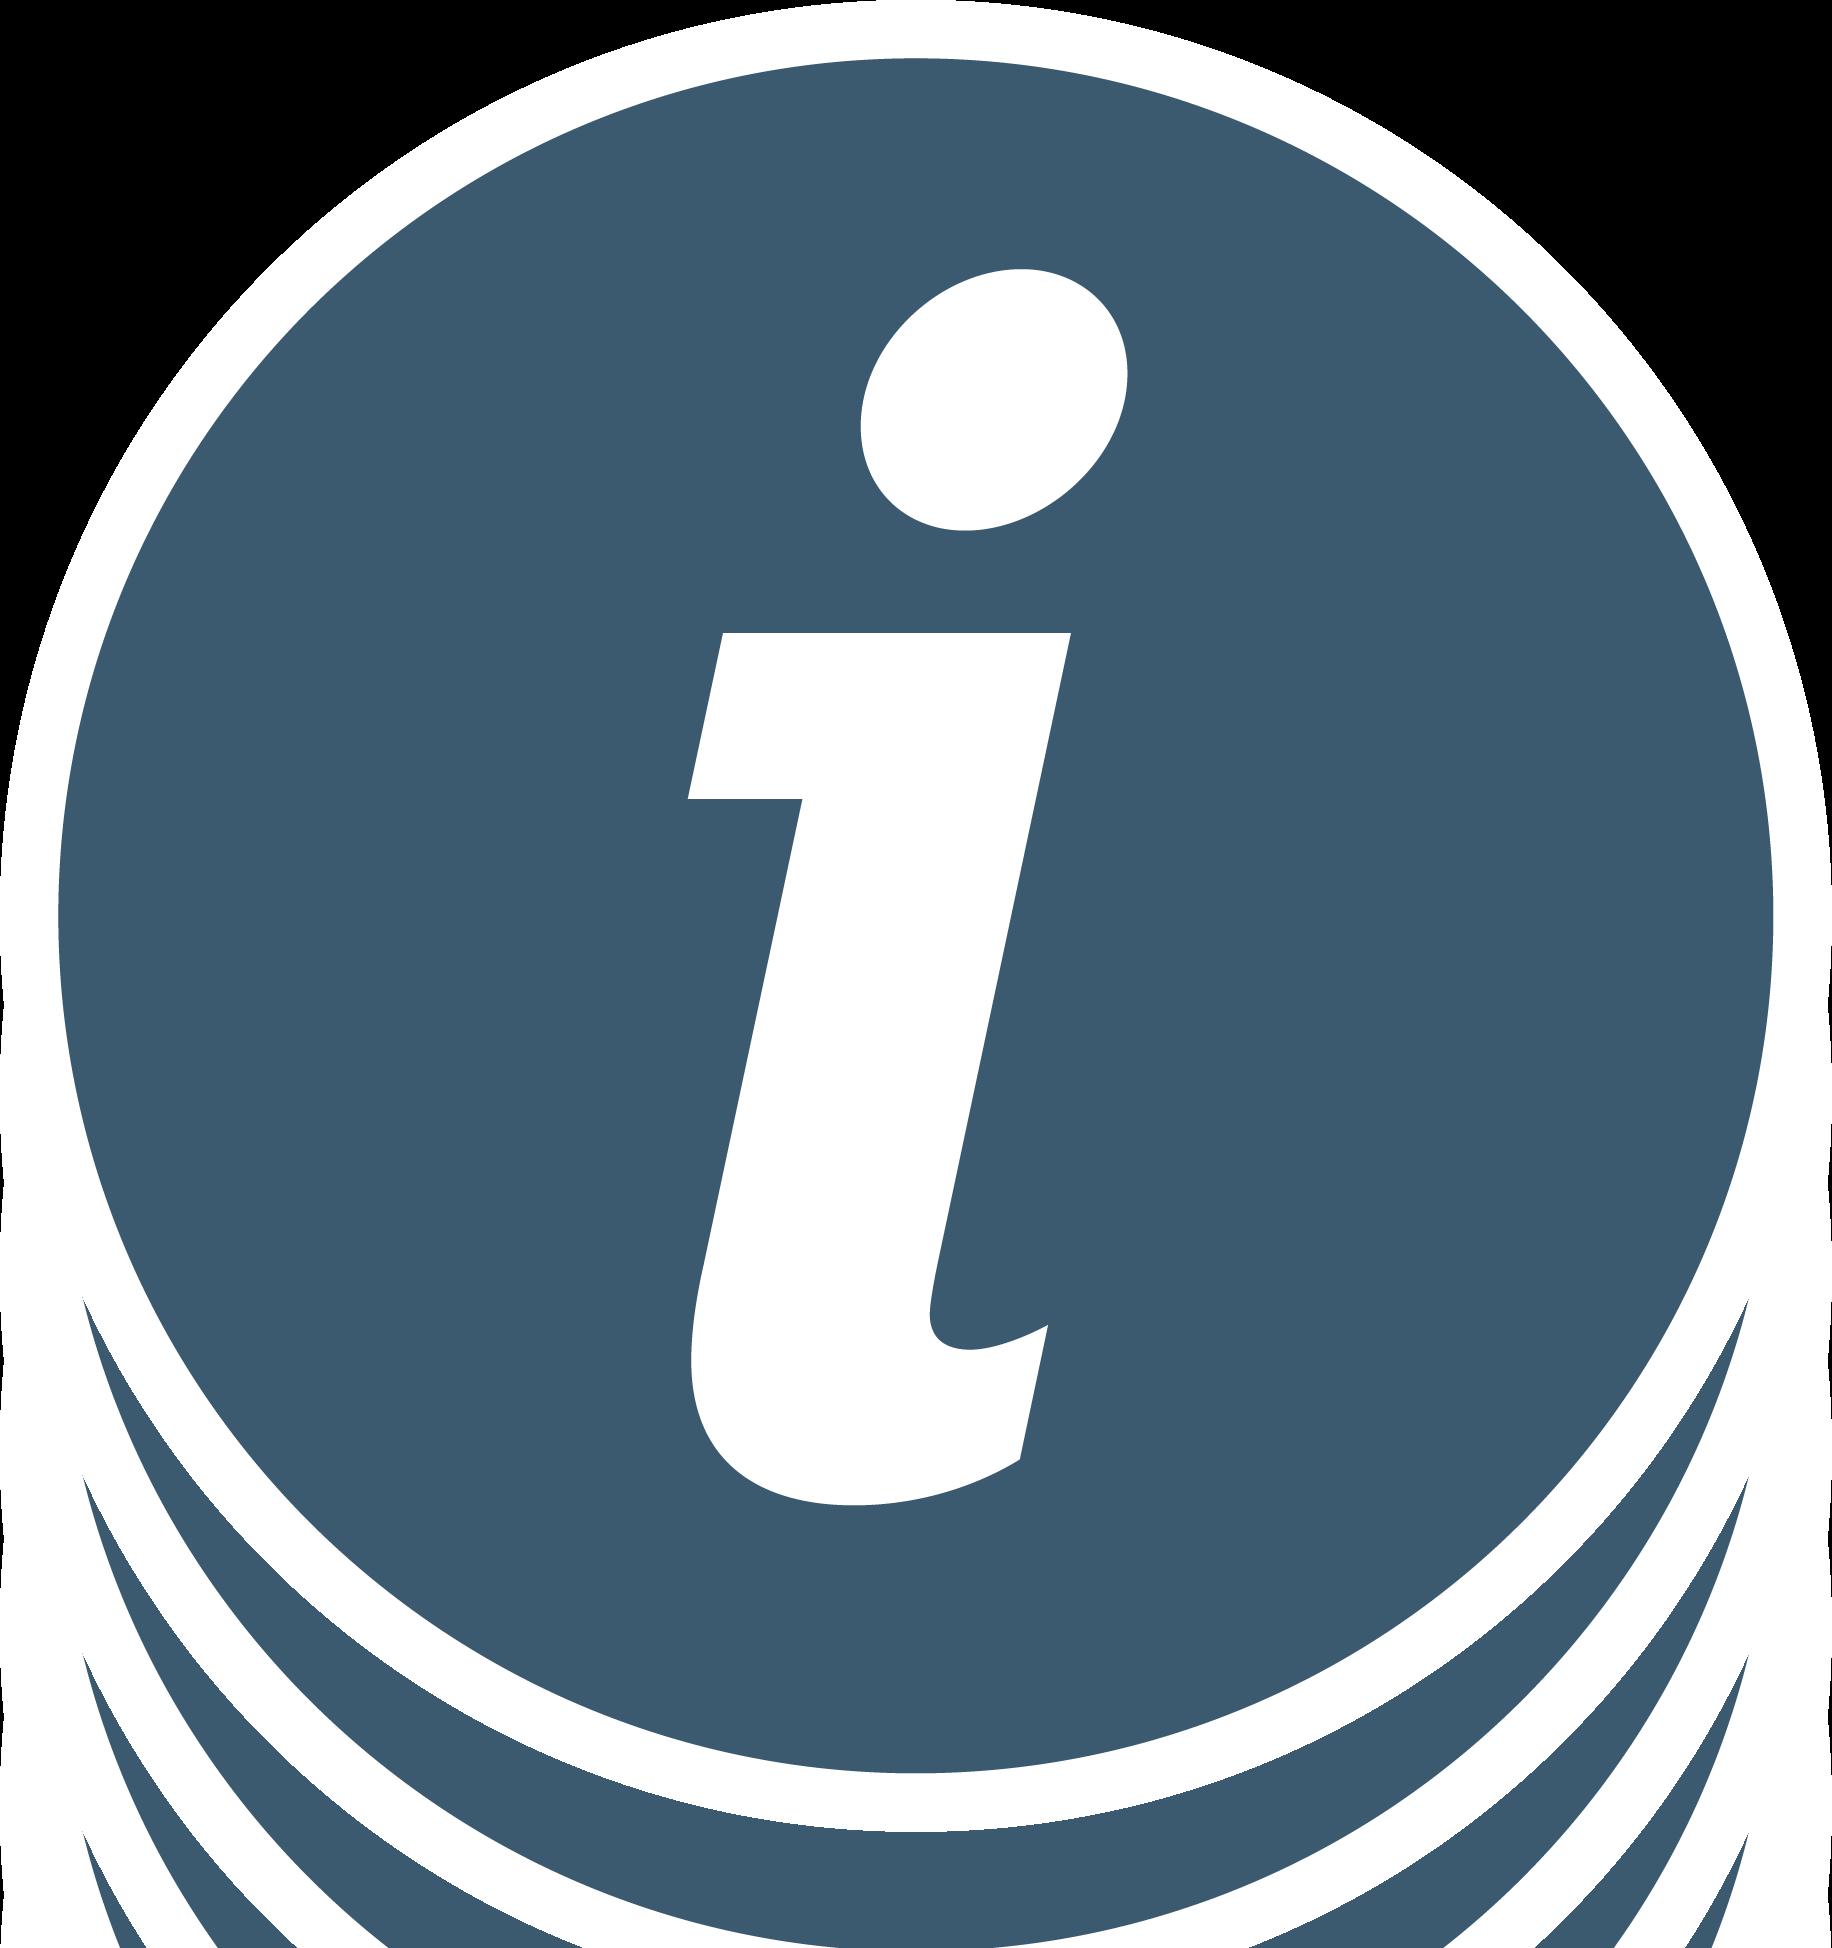 Information Icon image #6058